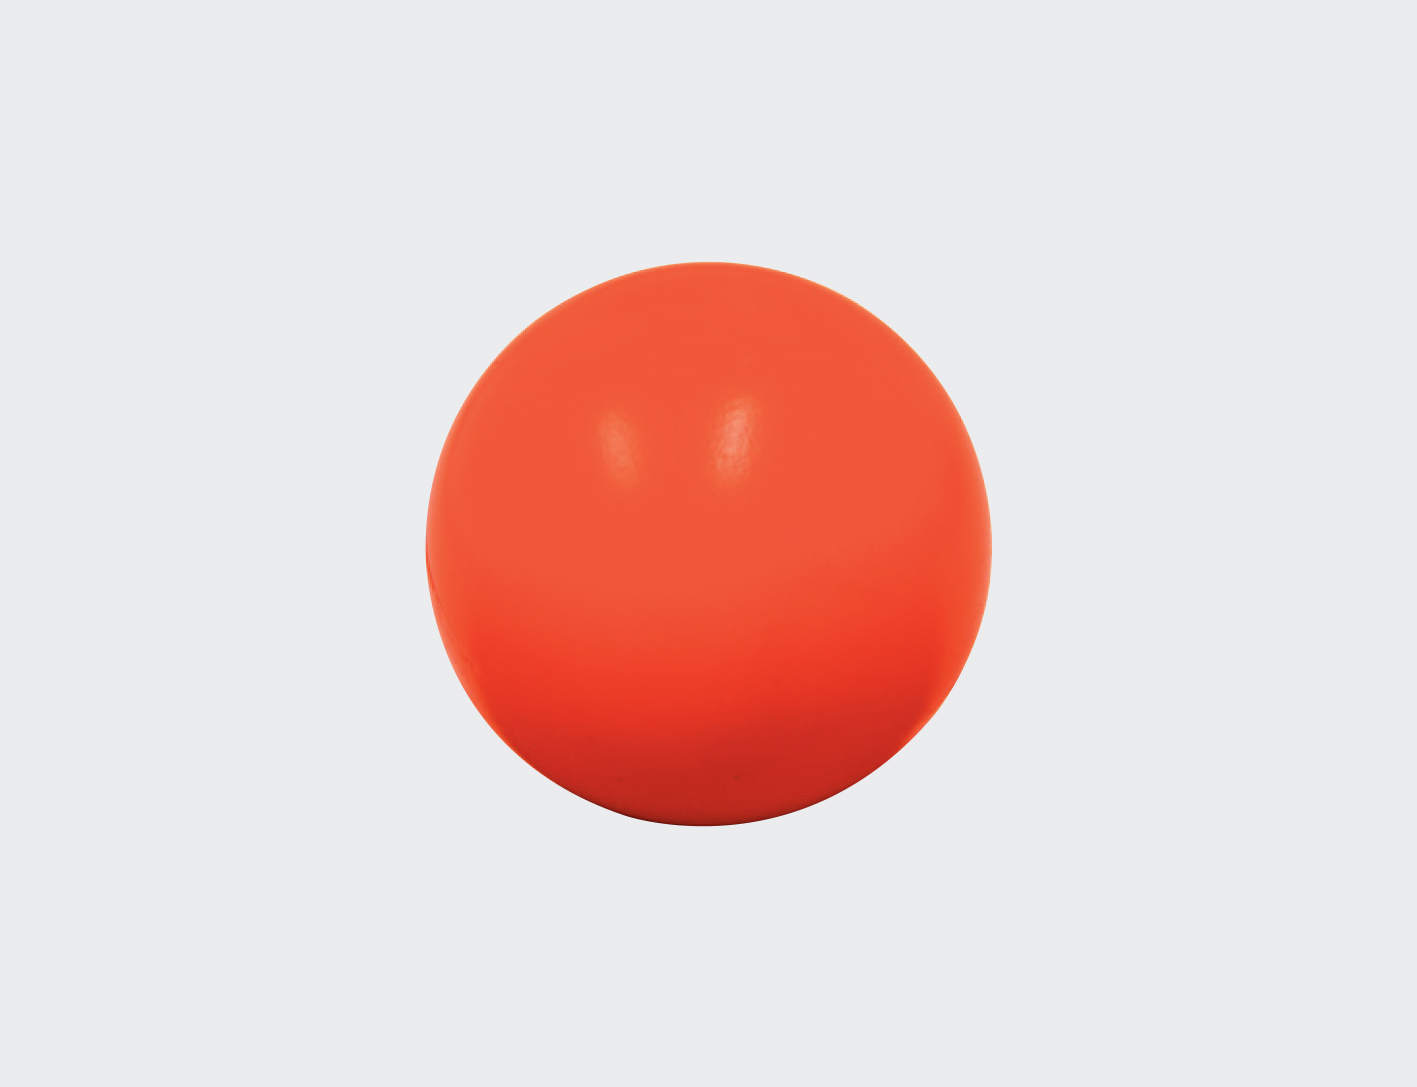 Sofcrosse Balls